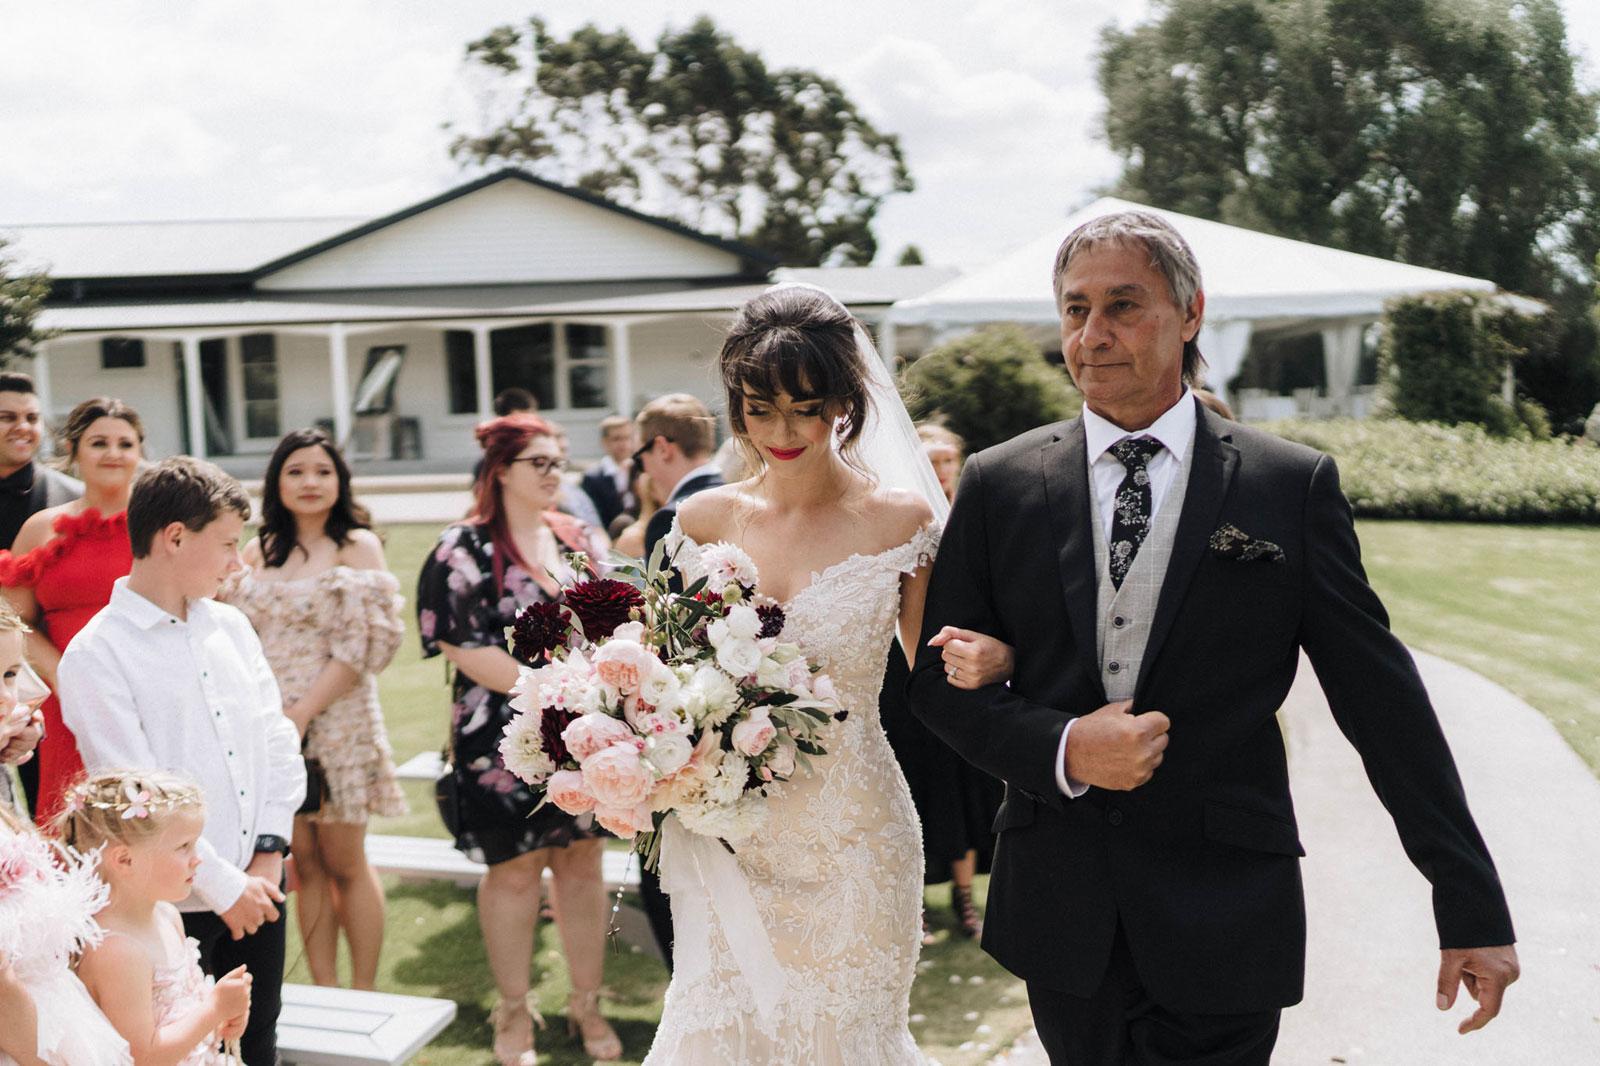 newfound-n-c-olive-tree-cottage-tauranga-wedding-photographer-405